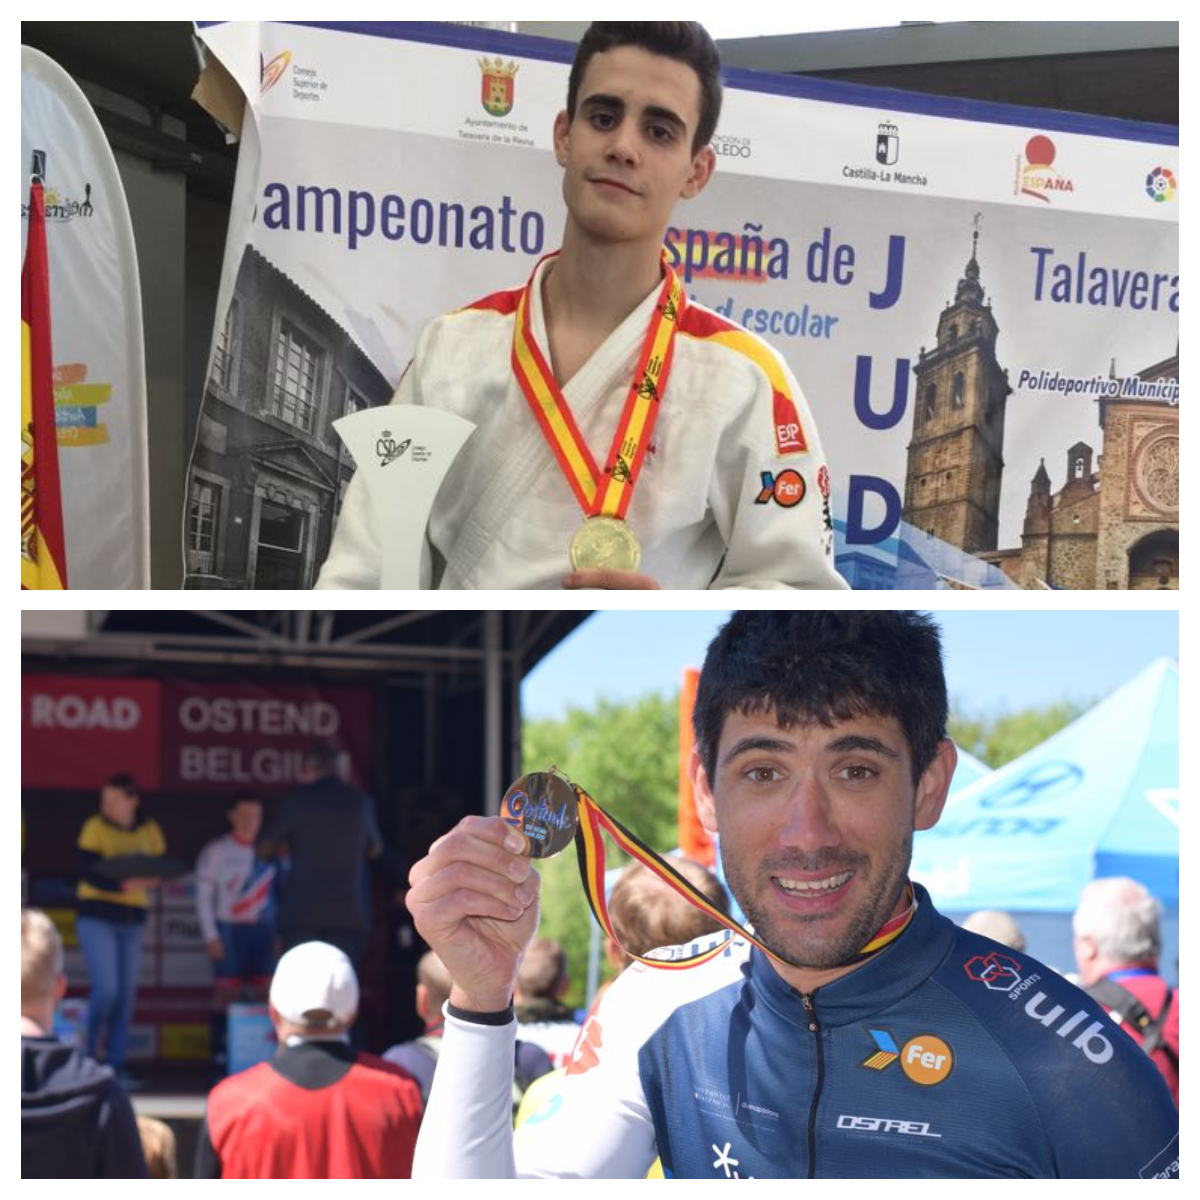 Pedro Gómez y Maurice Eckhard